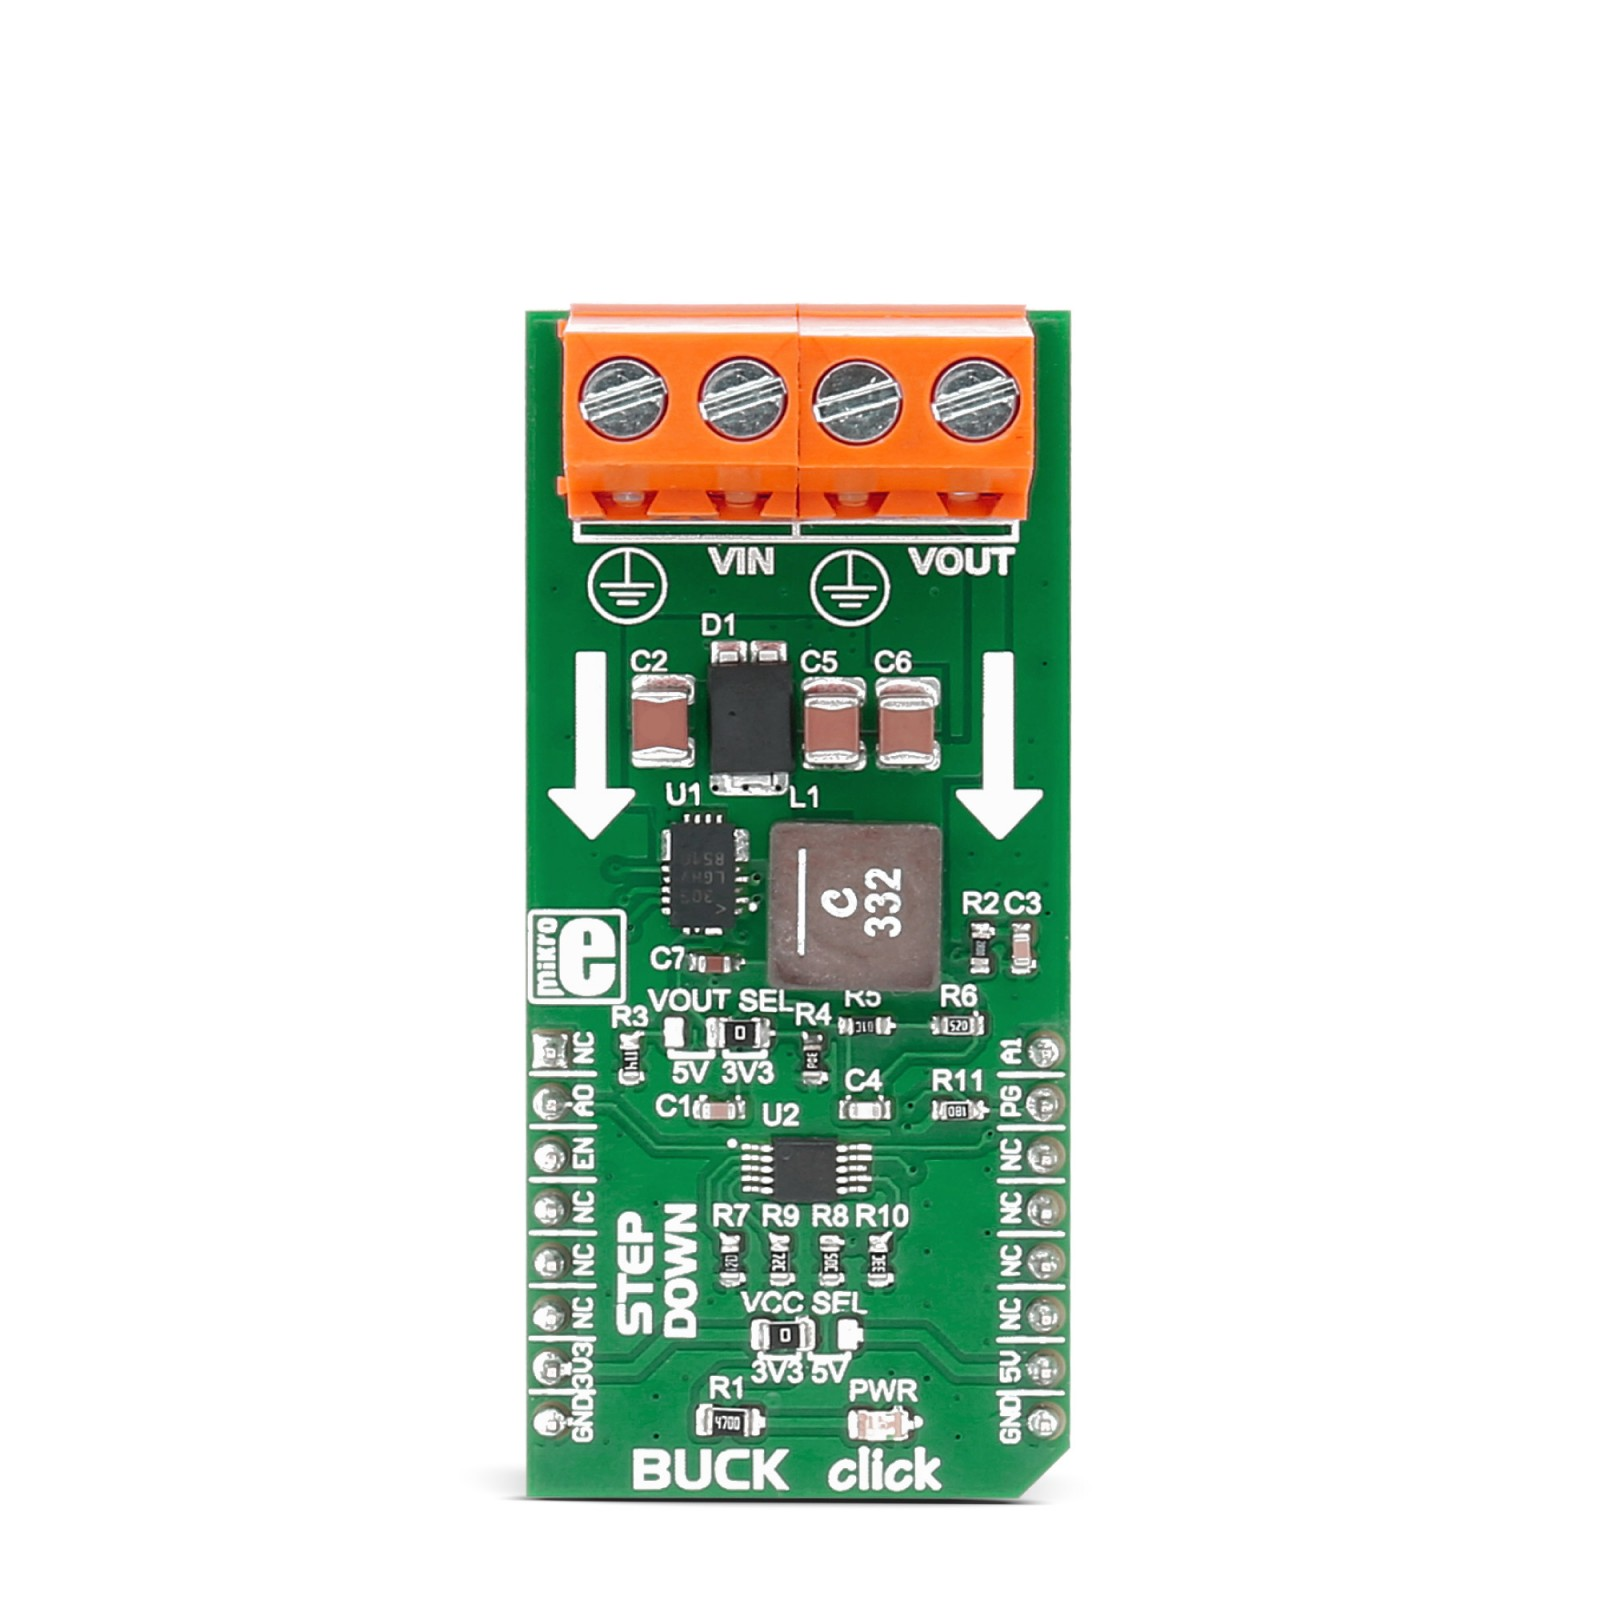 Buck Click Switching Regulator Mikroelektronika Wide Input Range Analog Mux Mgctlbxnmzp Mgctlbxv5112 Mgctlbxlc Mgctlbxpprestashop